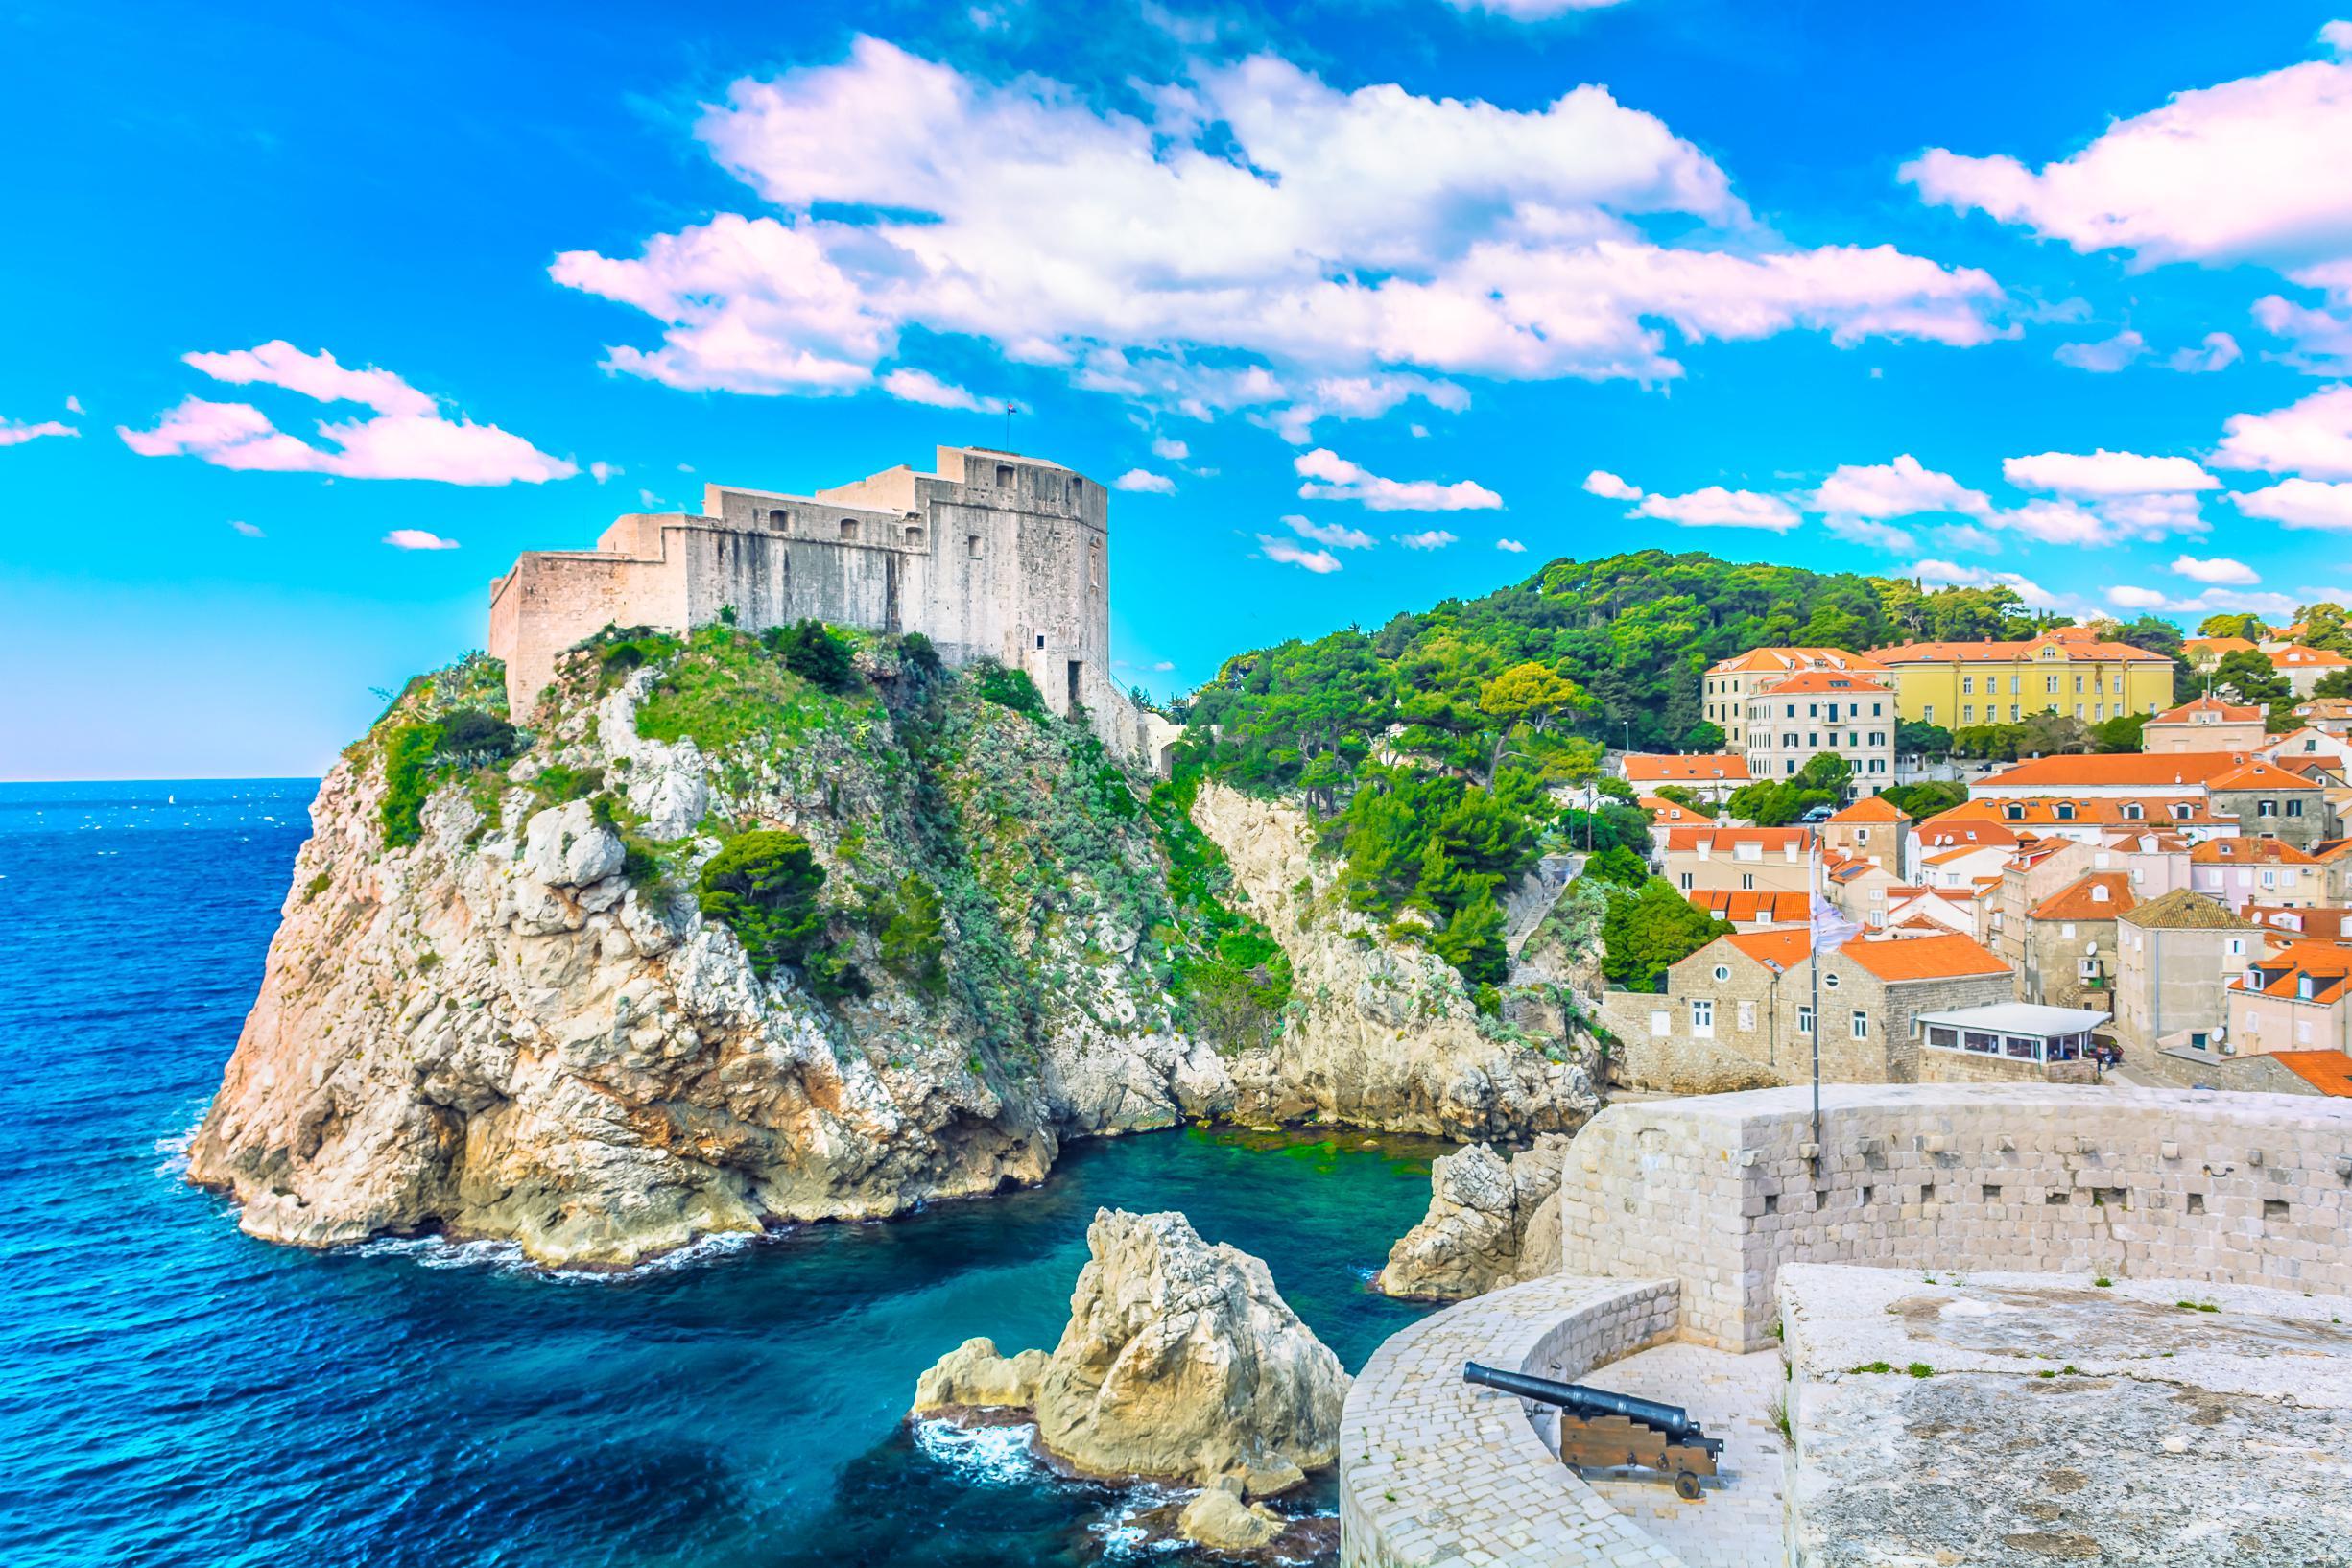 Kings Landing Dubrovnik